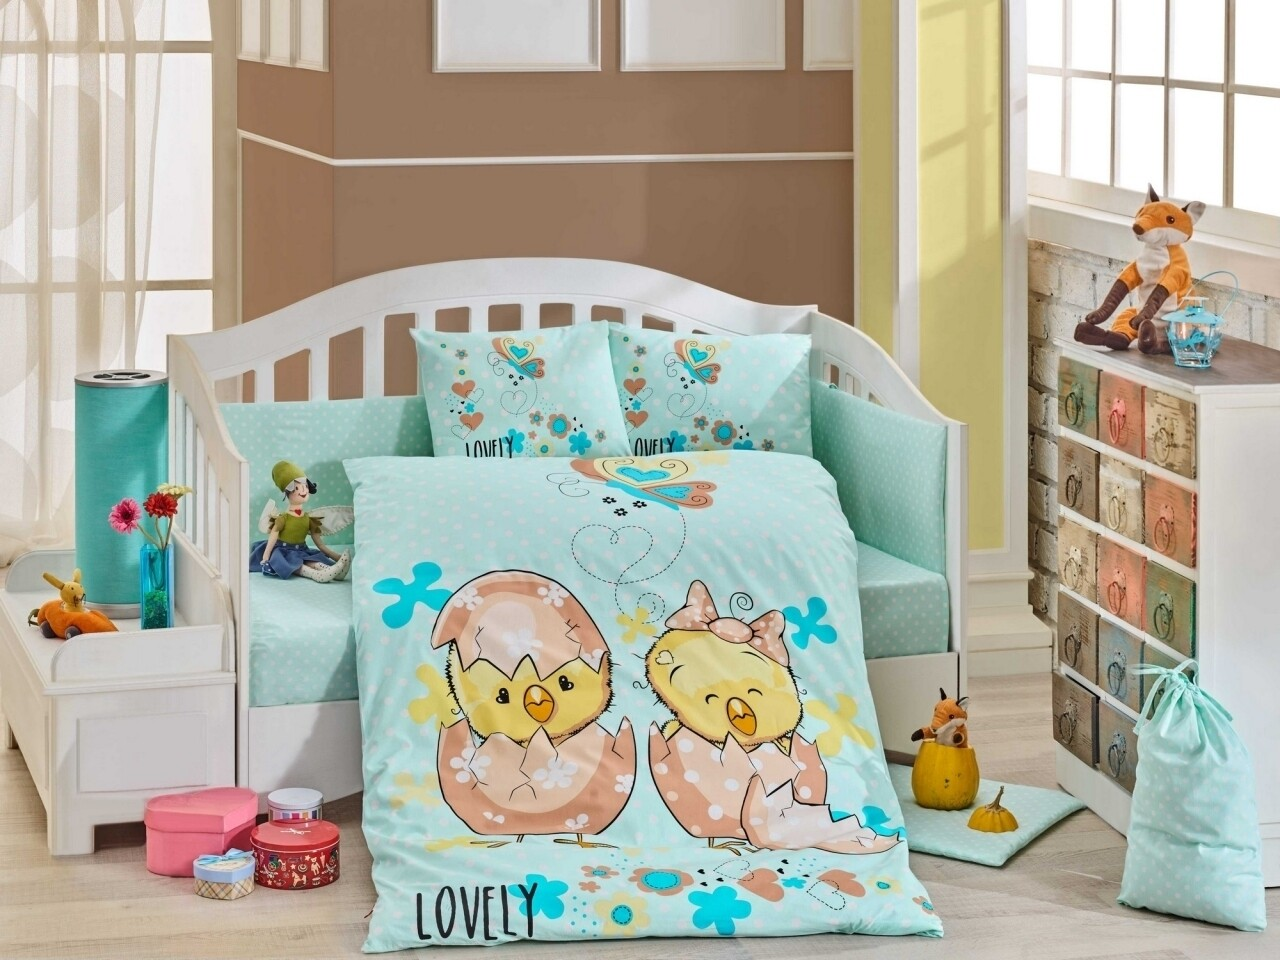 Lenjerie de pat pentru copii Lovely Mint, Hobby, 4 piese, 100 x 150 cm, 100% bumbac poplin, multicolora